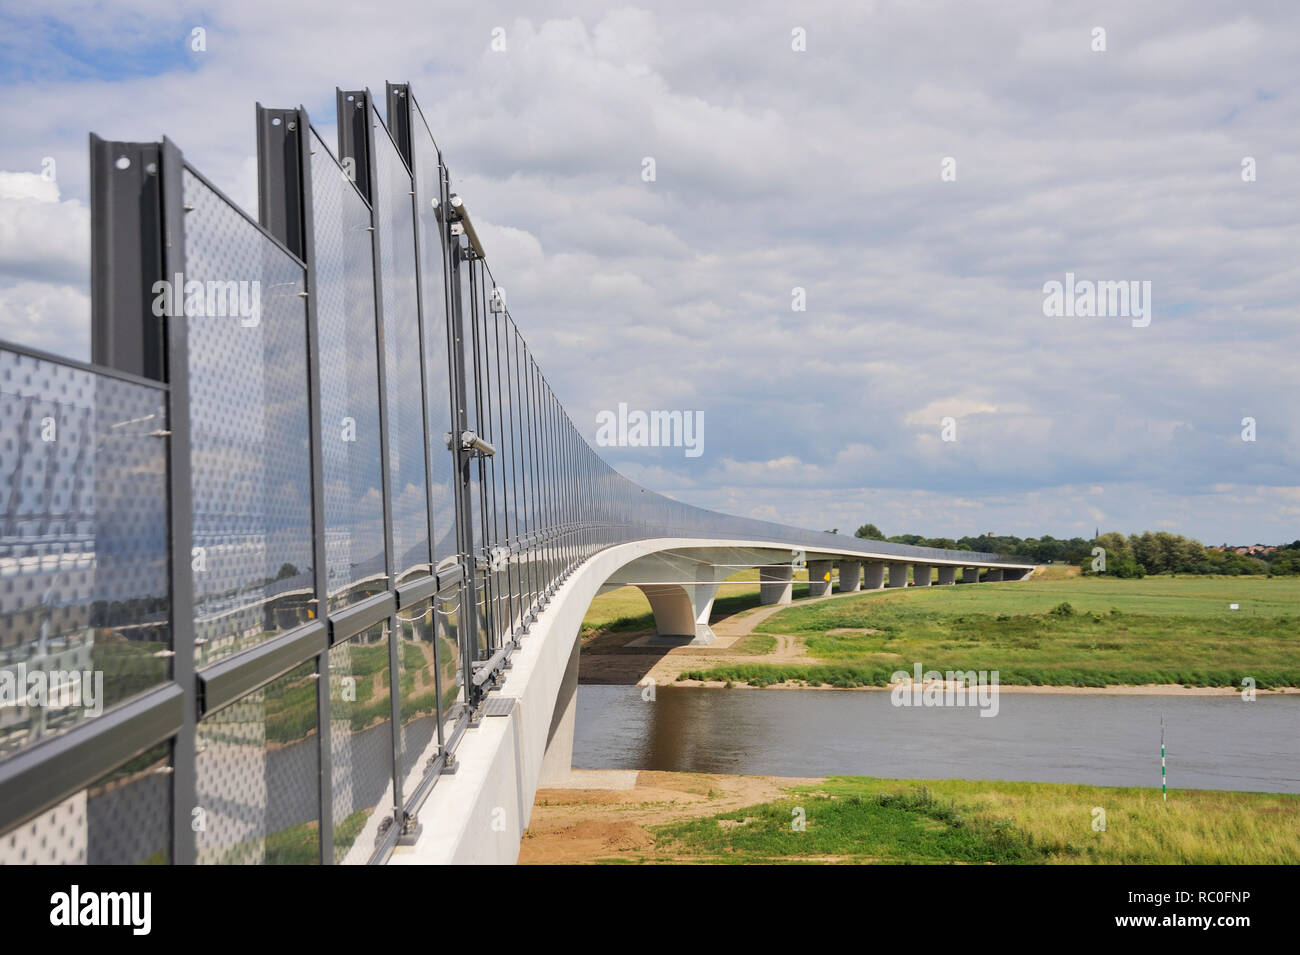 Elbebrücke Mühlberg, Stahlverbundbrücke, Mühlberg an der Elbe, Elberadweg, Landkreis Elbe-Elster, Brandenburg, Deutschland, Europa   Elbe Bridge Muehl - Stock Image